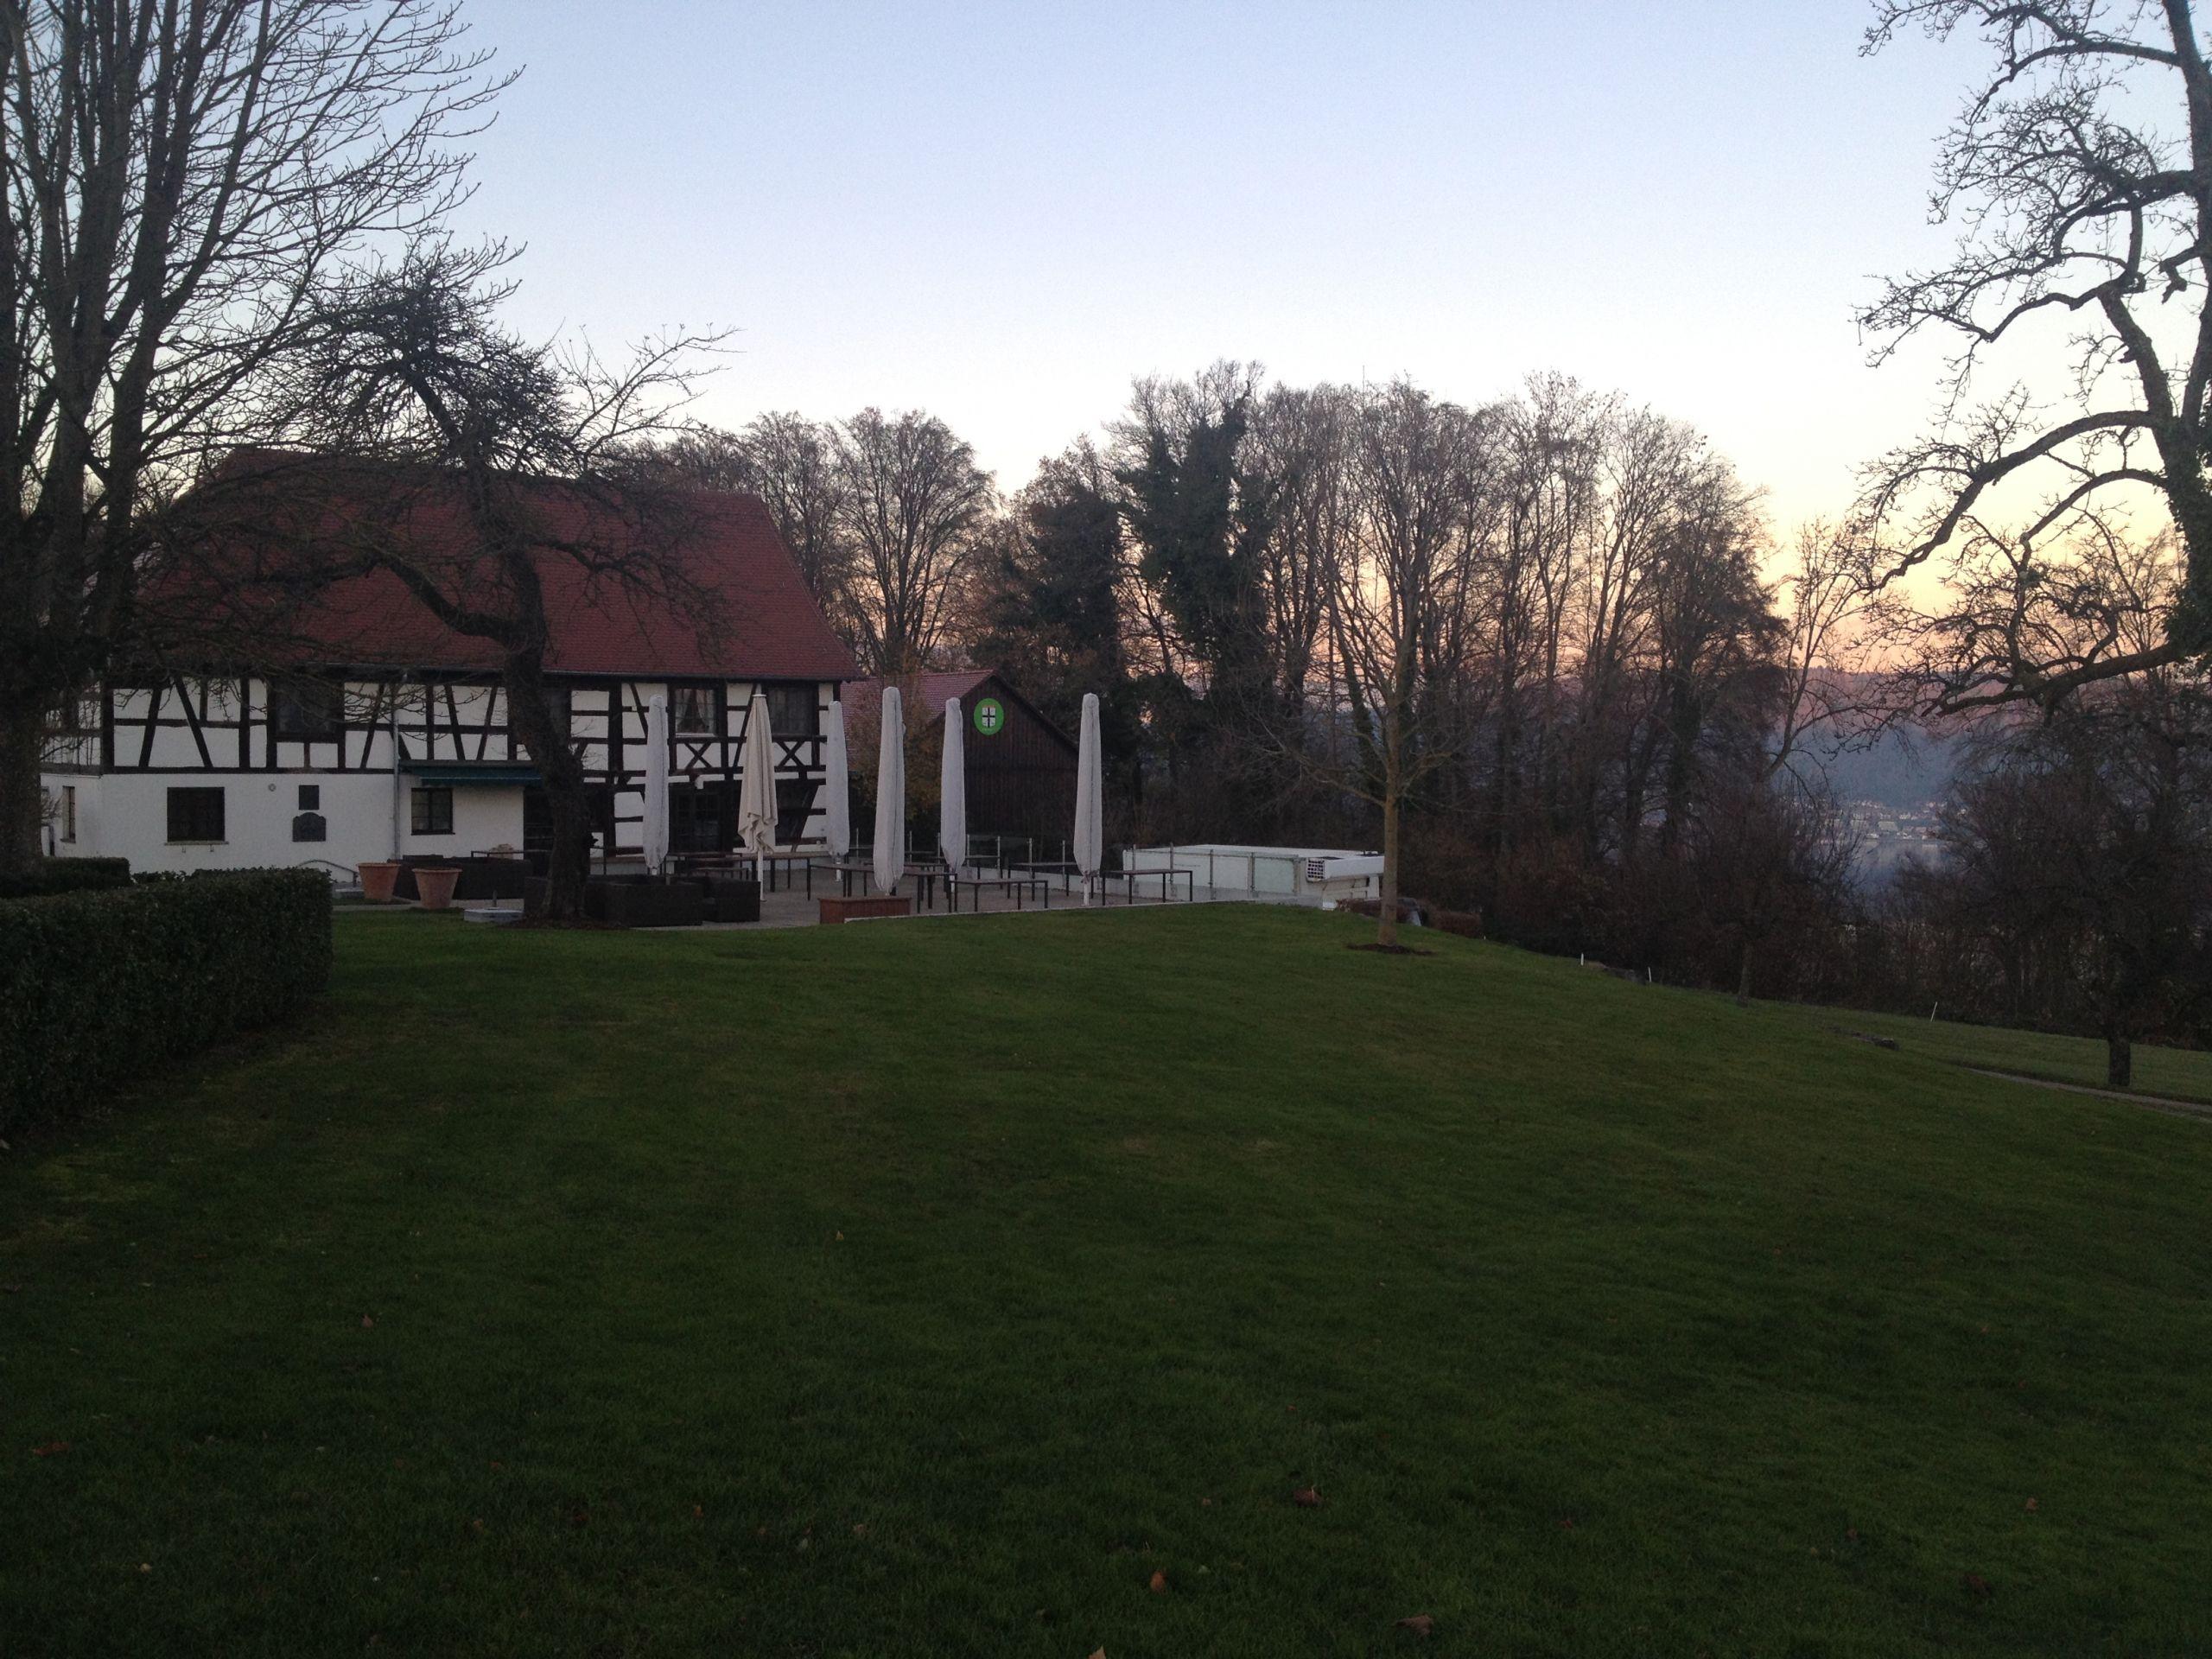 Idee Jardin Paysagiste Luxe Erste Winterimpressionen ‹ Restaurant Haus Am Markt Bad Saulgau Of 69 Frais Idee Jardin Paysagiste